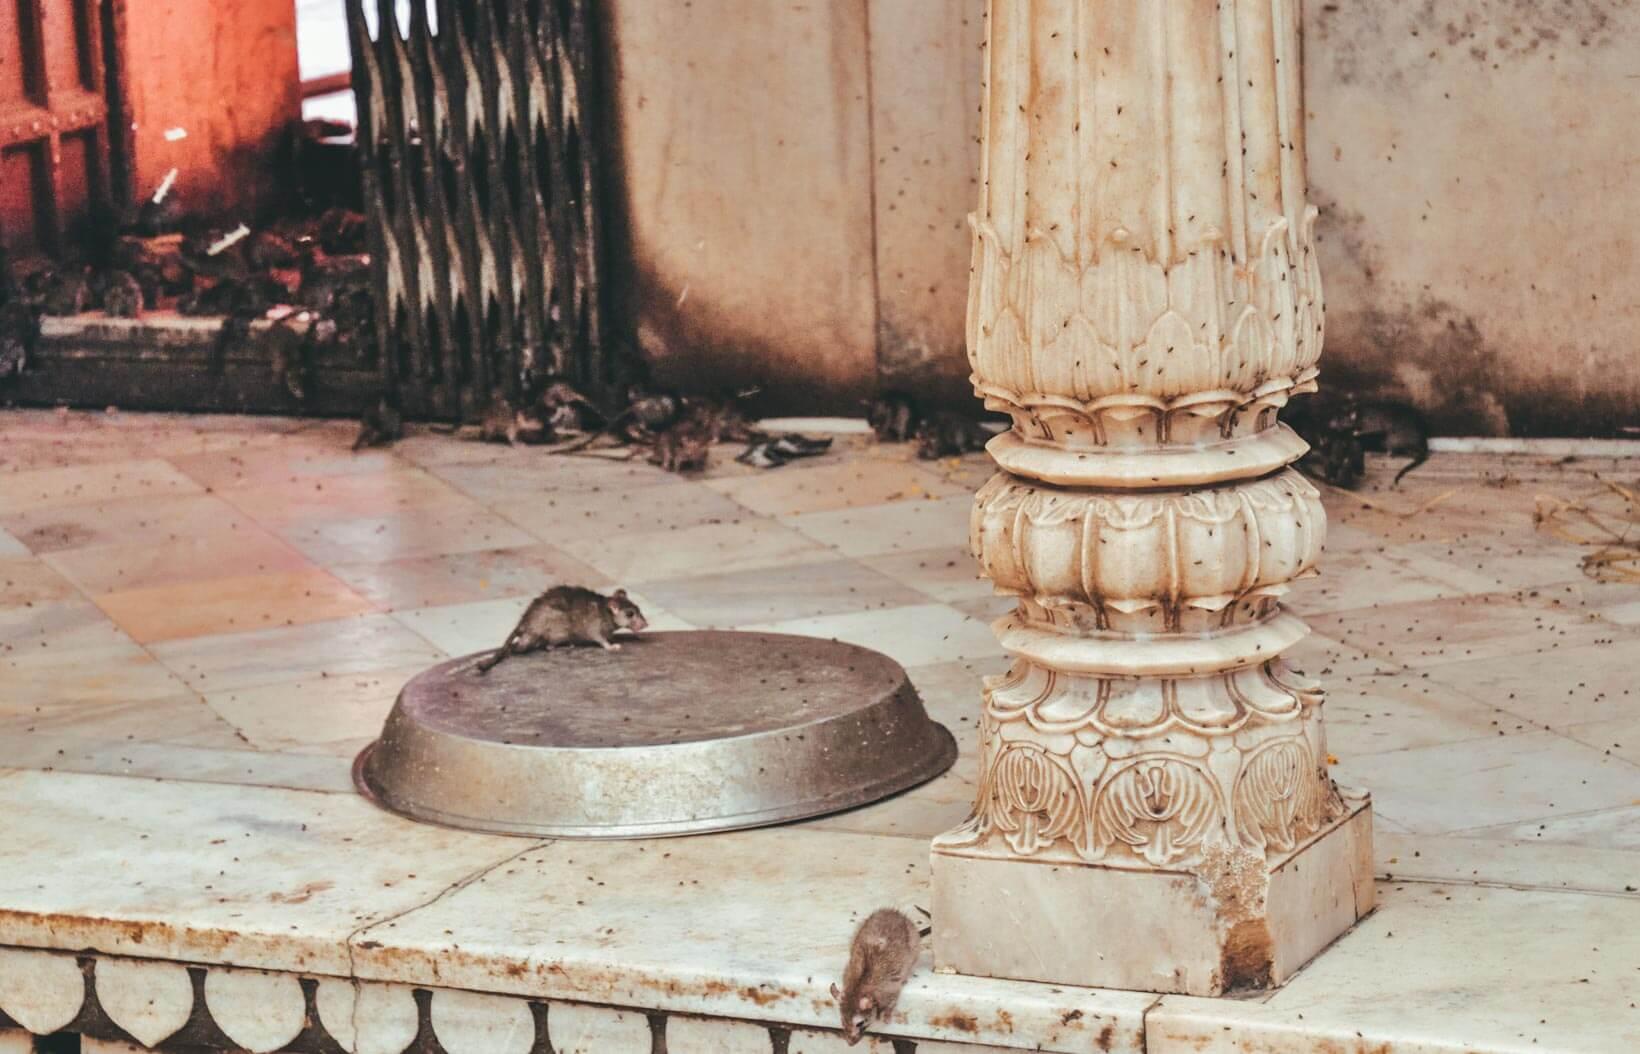 Karni Mata Mandir il tempio dei topi in Rajasthan